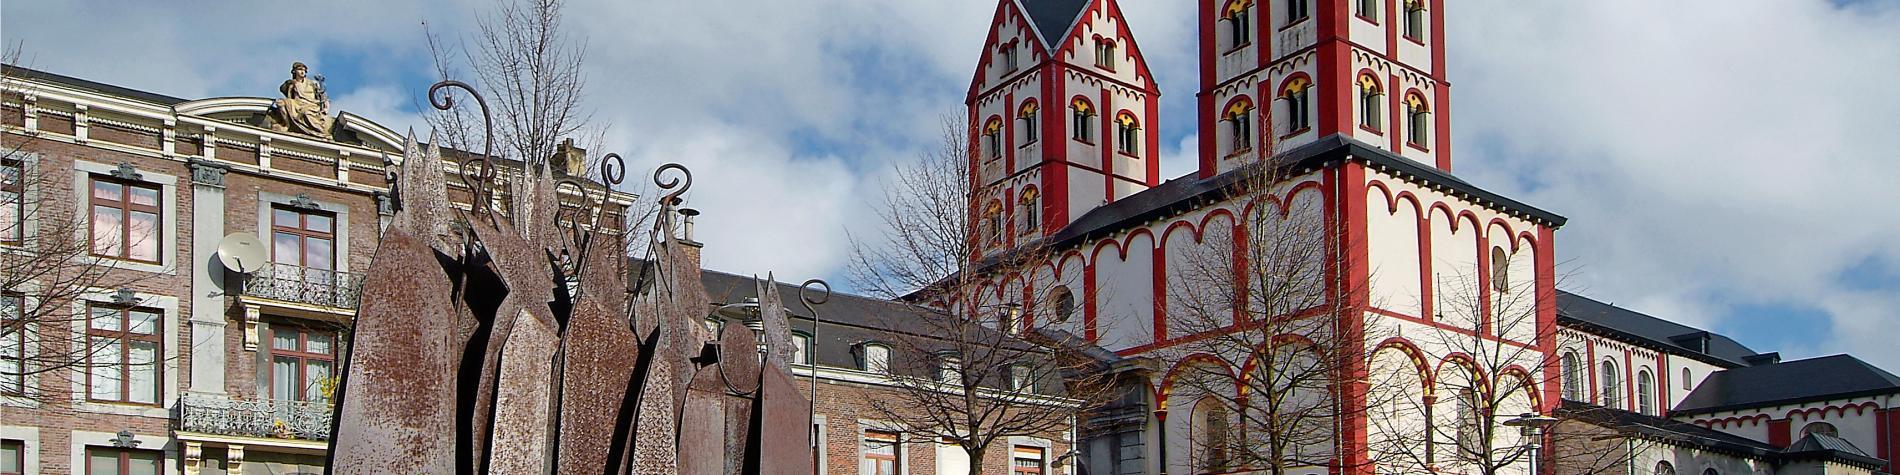 Liège - place Saint-Barthelemy